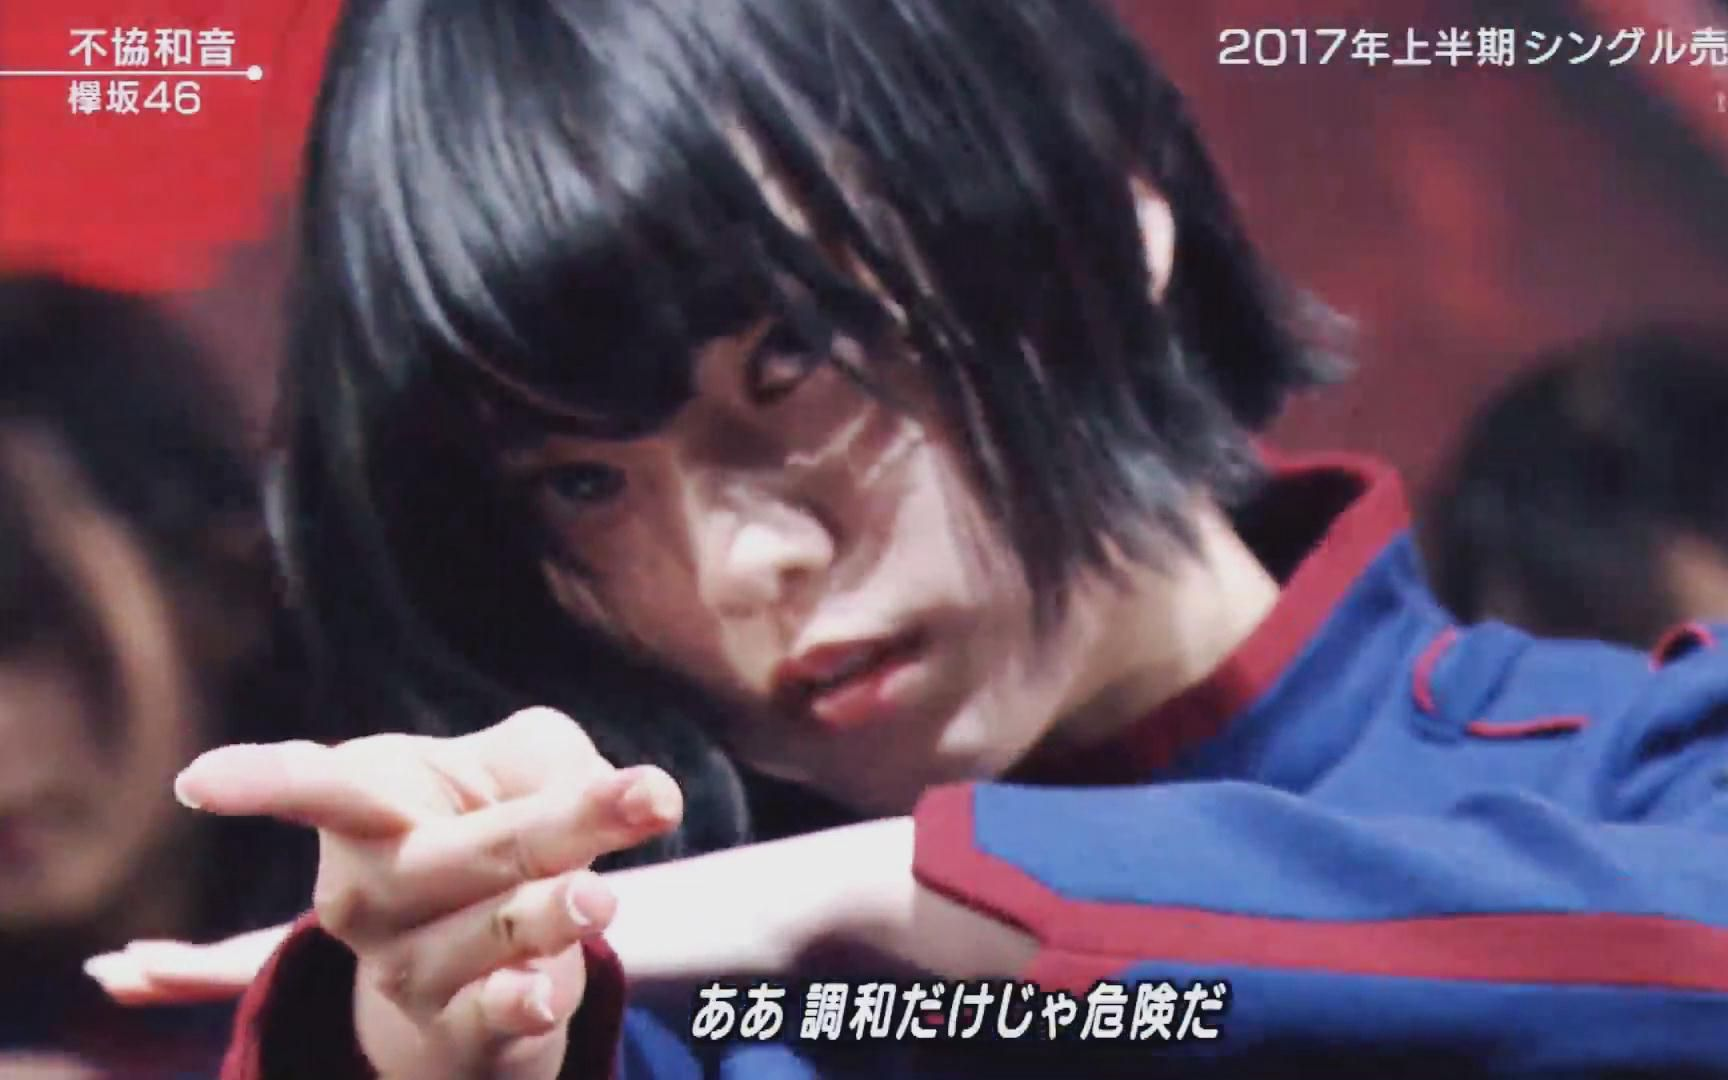 欅坂46 平手友梨奈 不协和音live混剪 哔哩哔哩 つロ干杯